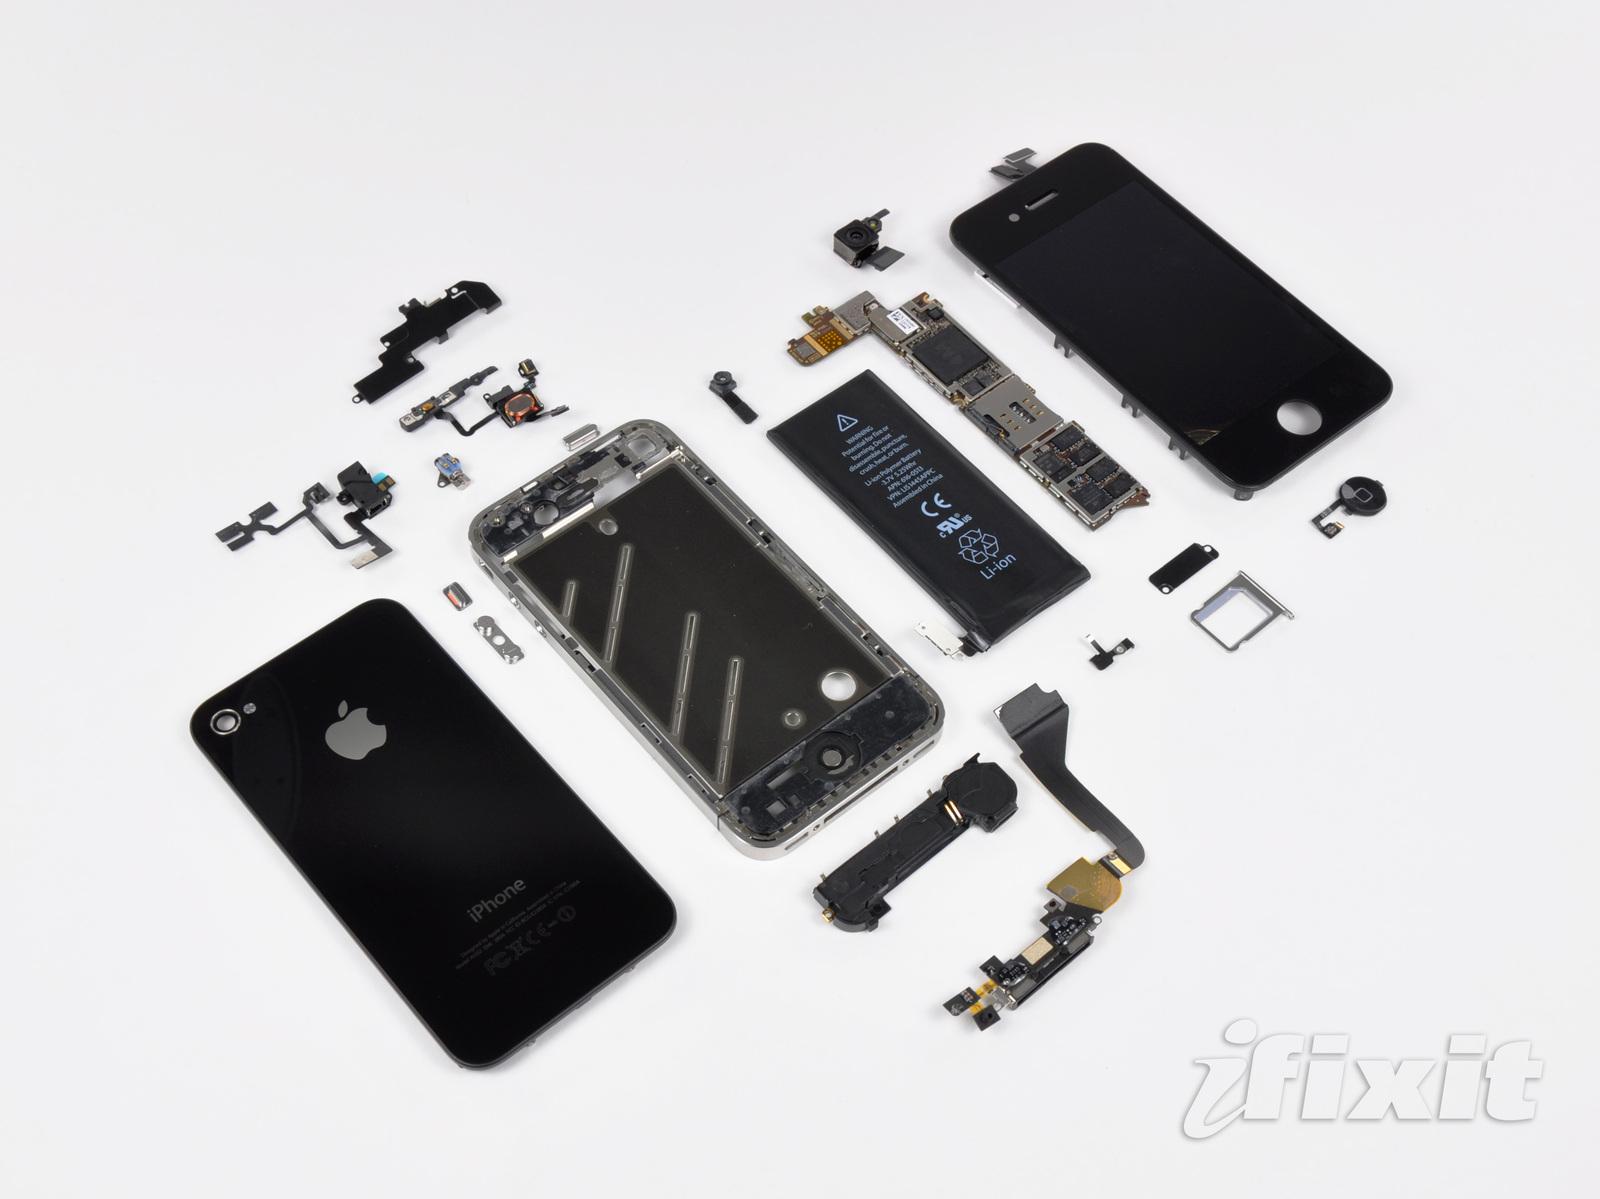 iFixit iPhone 4 teardown